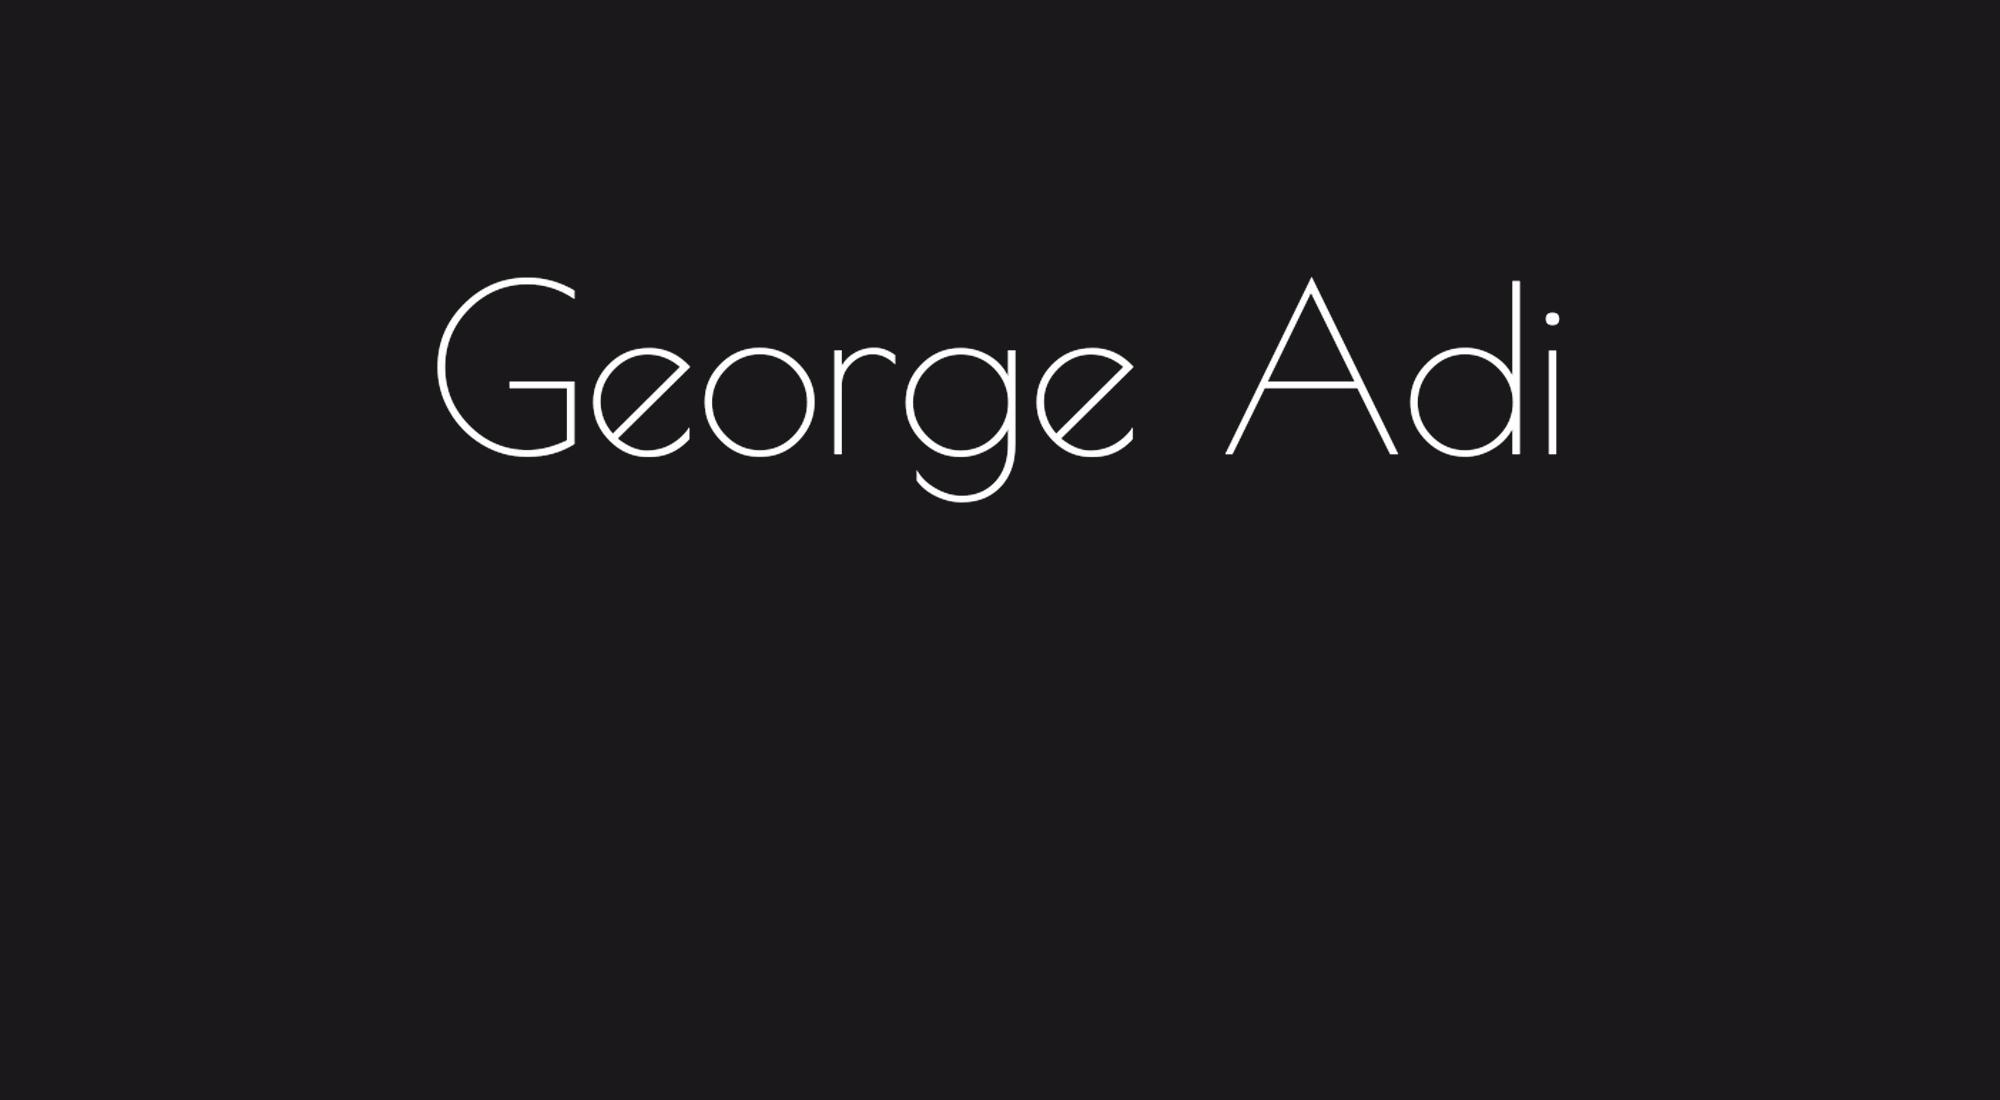 George Adi